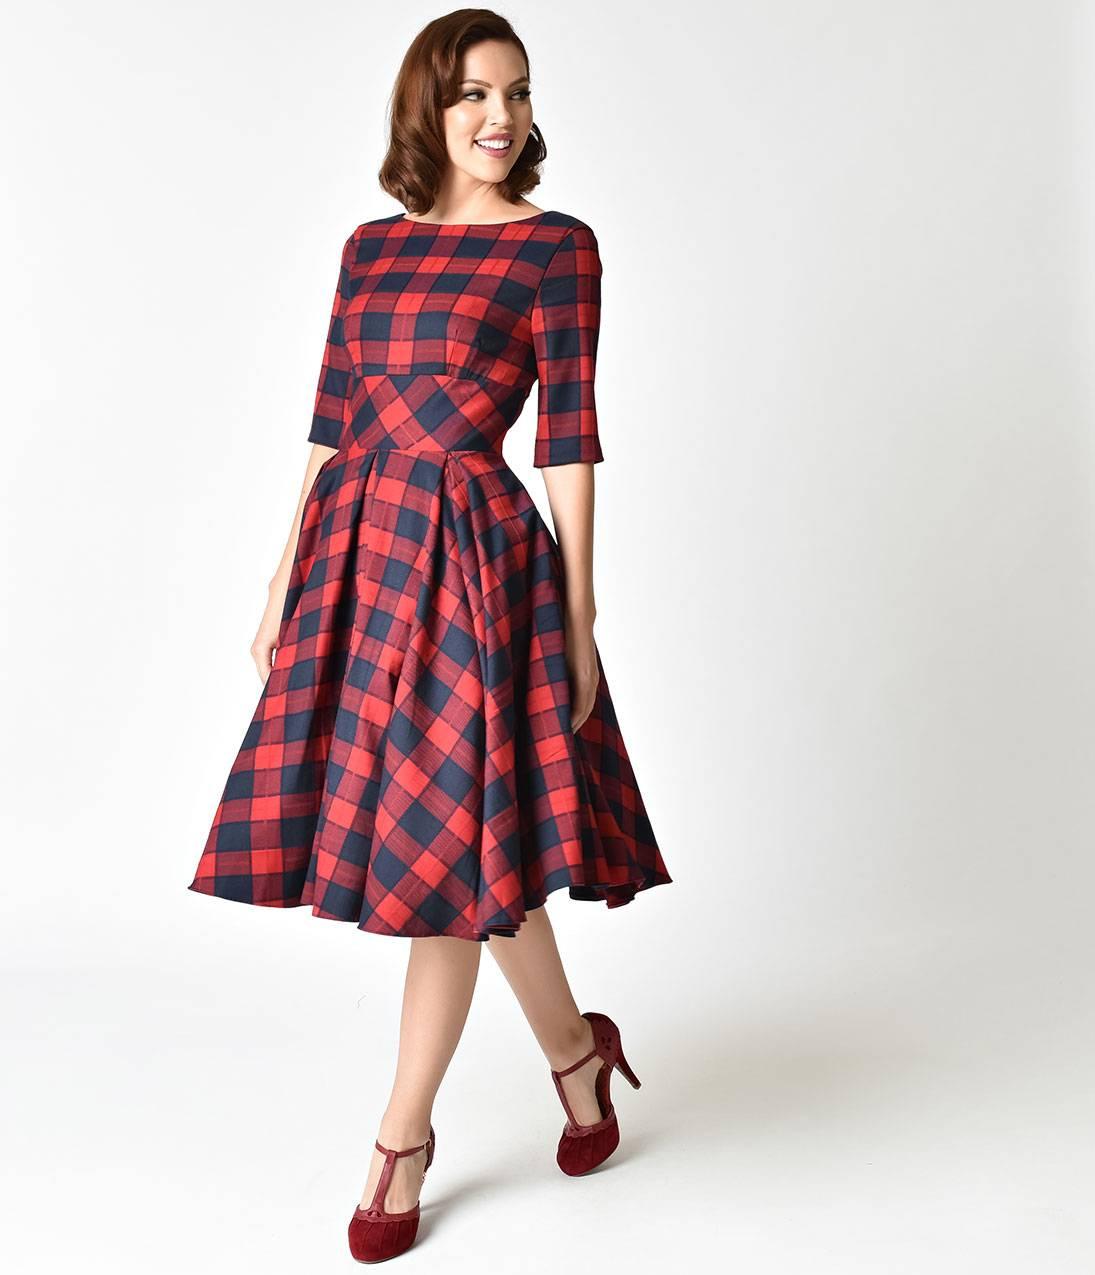 Atemberaubend 60s Prom Dress Fotos - Brautkleider Ideen ...